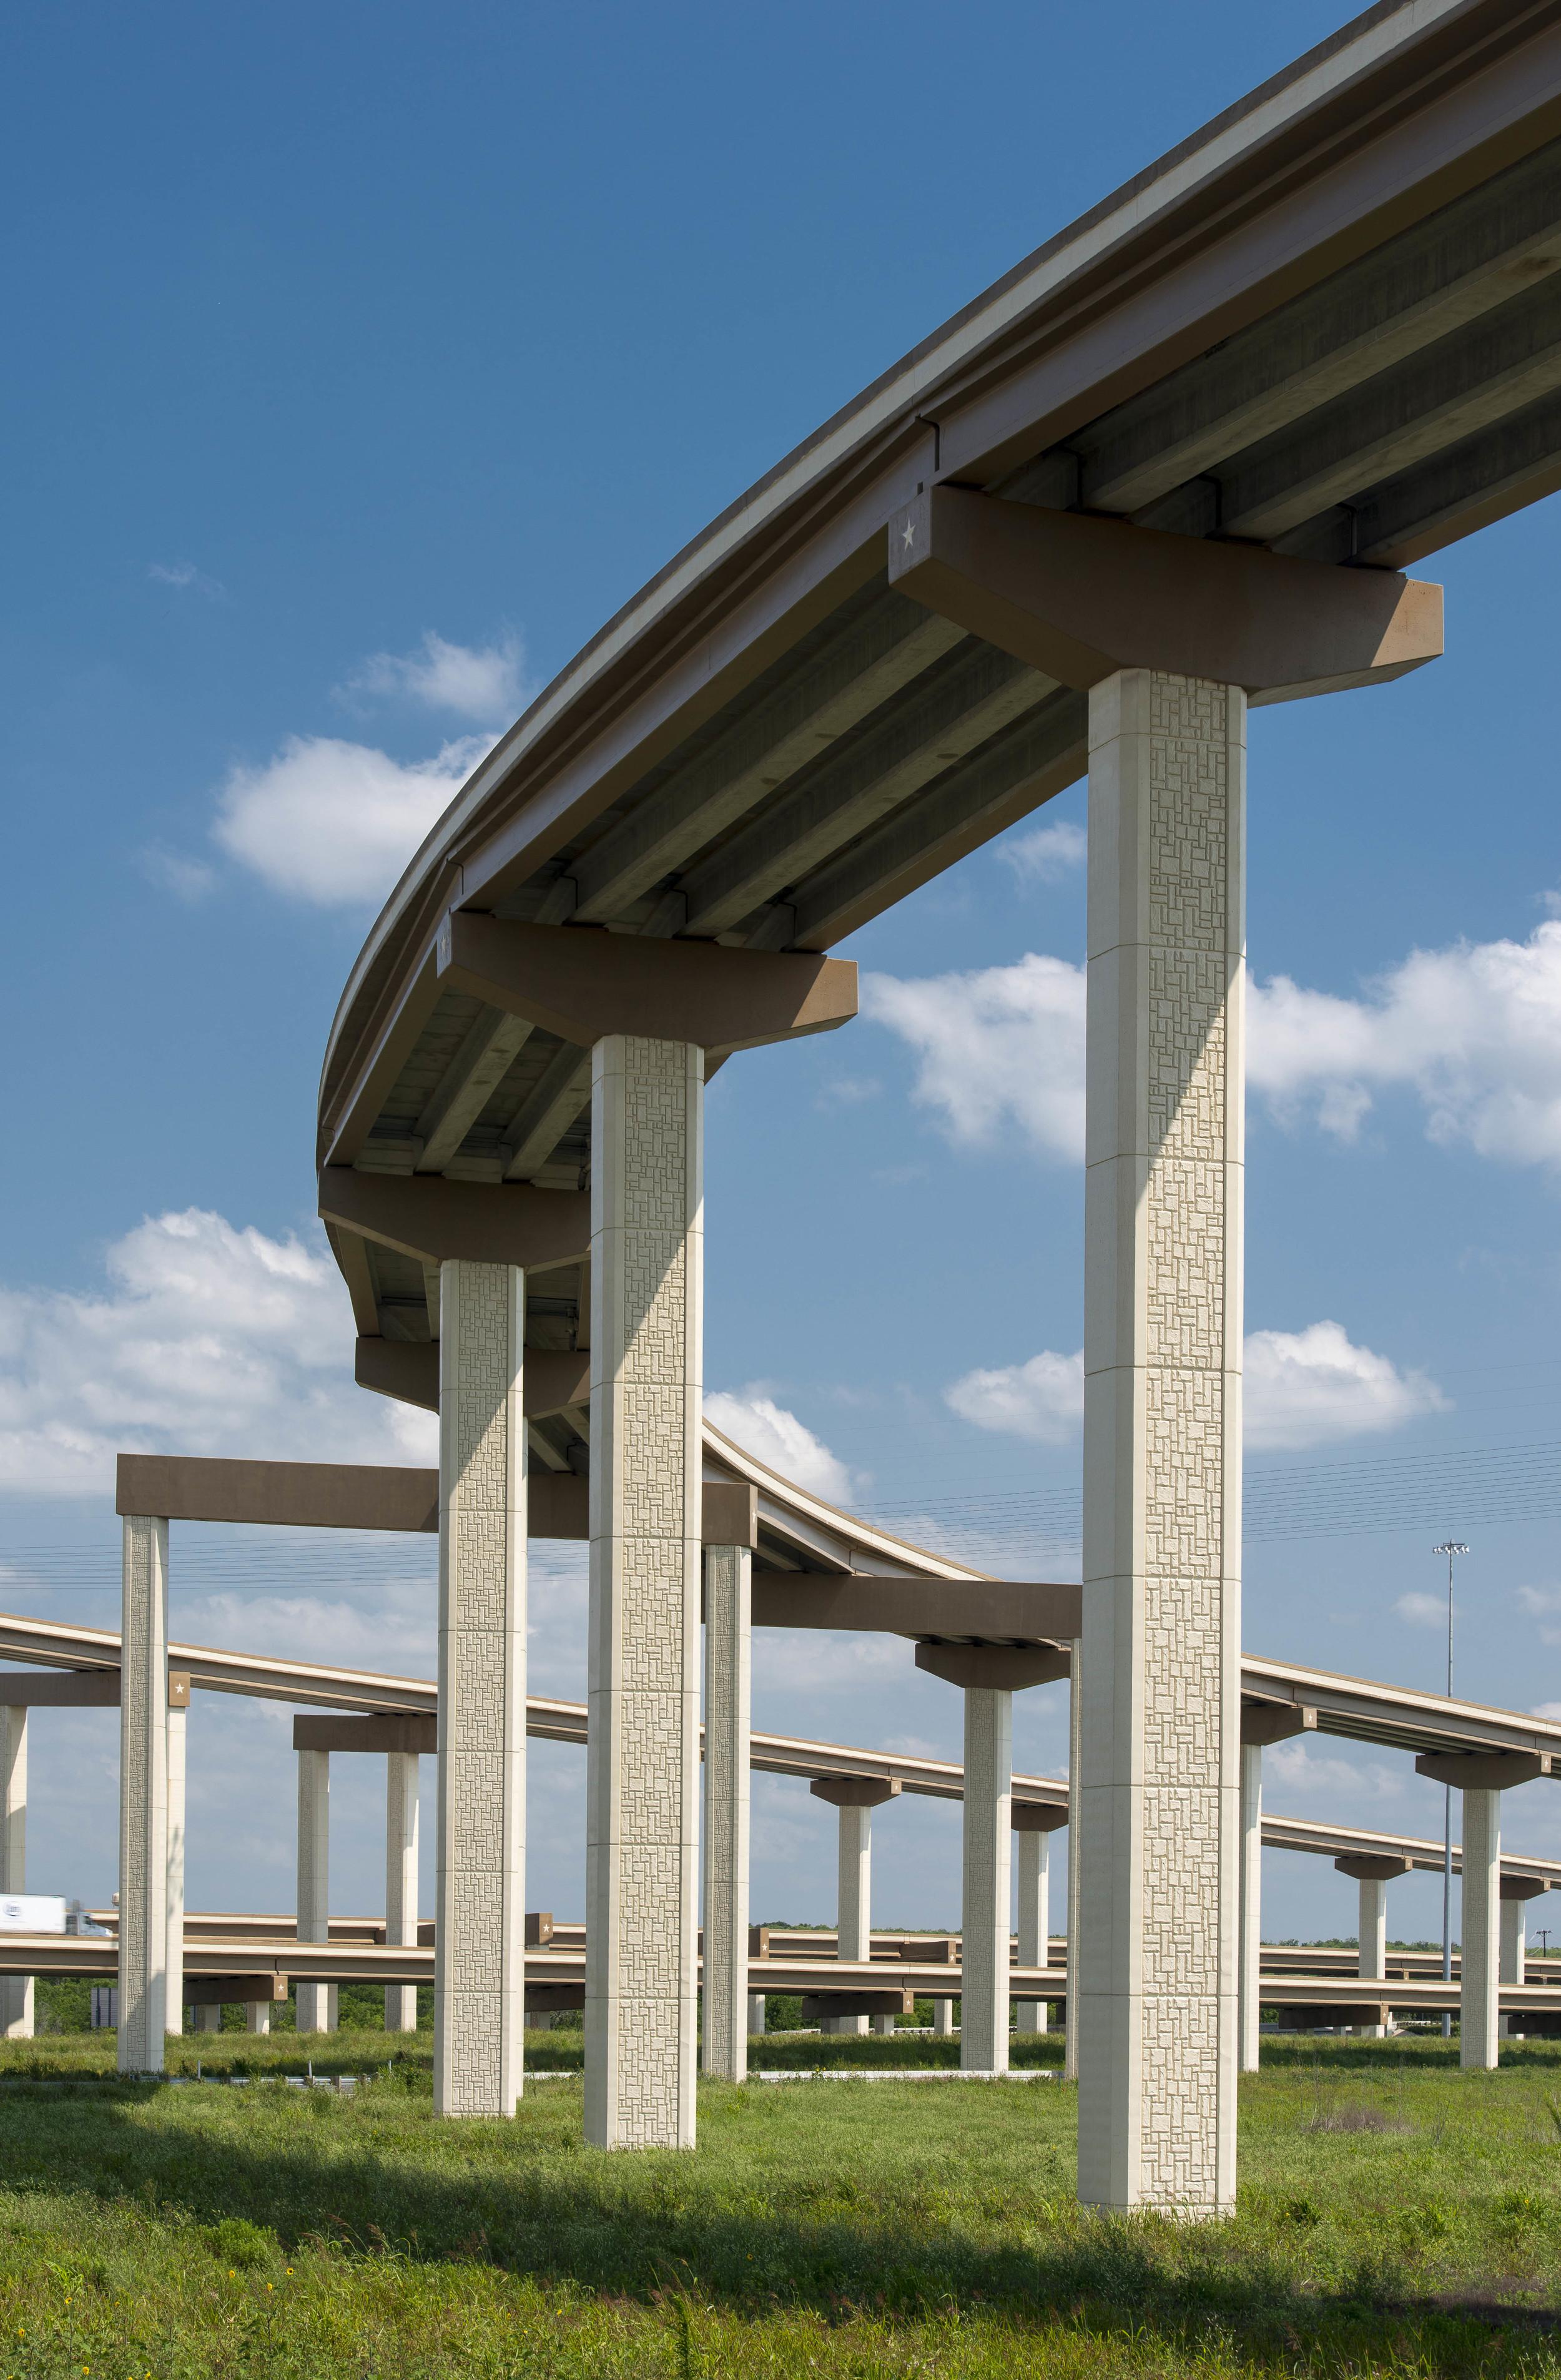 Texas_HWY_130_Toll_Road_201305_44.jpg